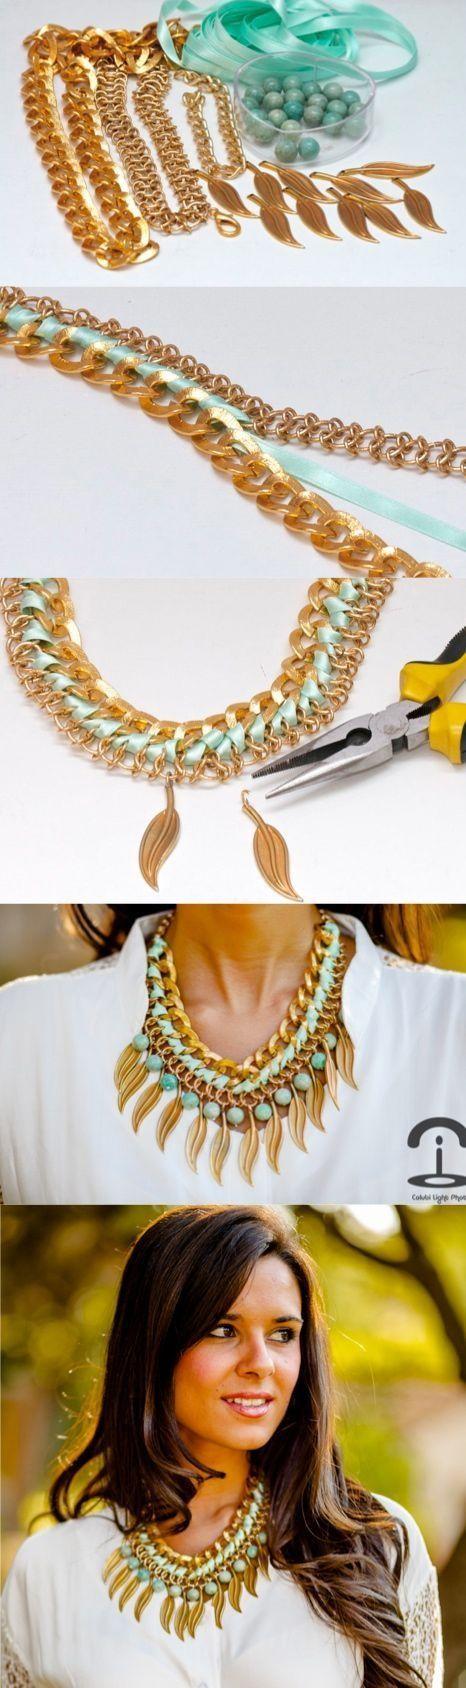 #DIY: Accesorios. Crea tus propios #accesorios para combinar tus #outfits a la perfección. #HazloTúMisma #Manualidades #Collares #Aretes